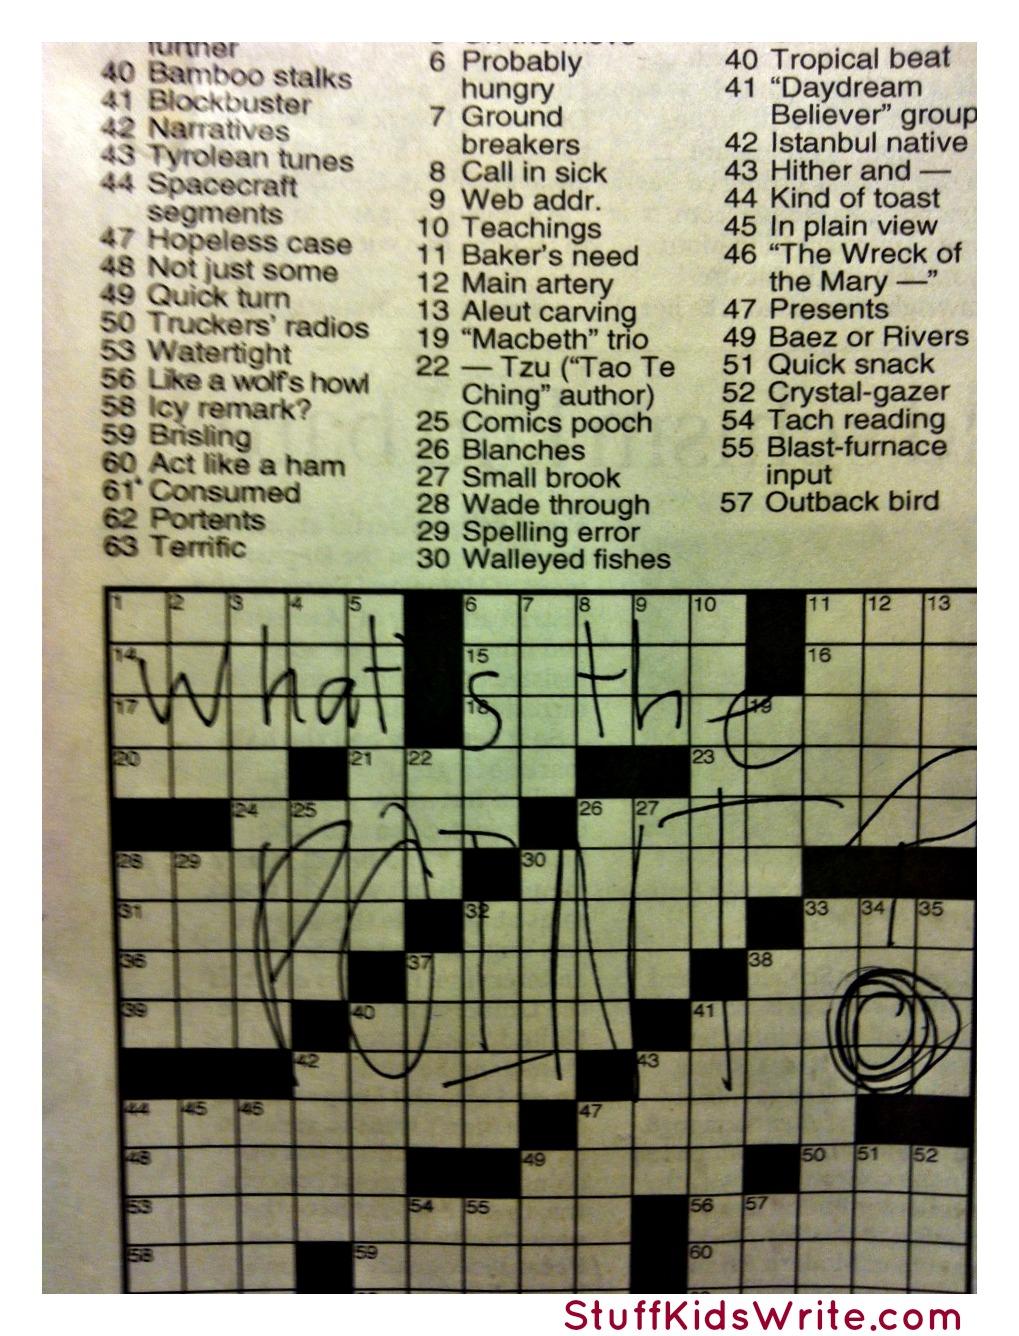 Beloved in rigoletto crossword clue